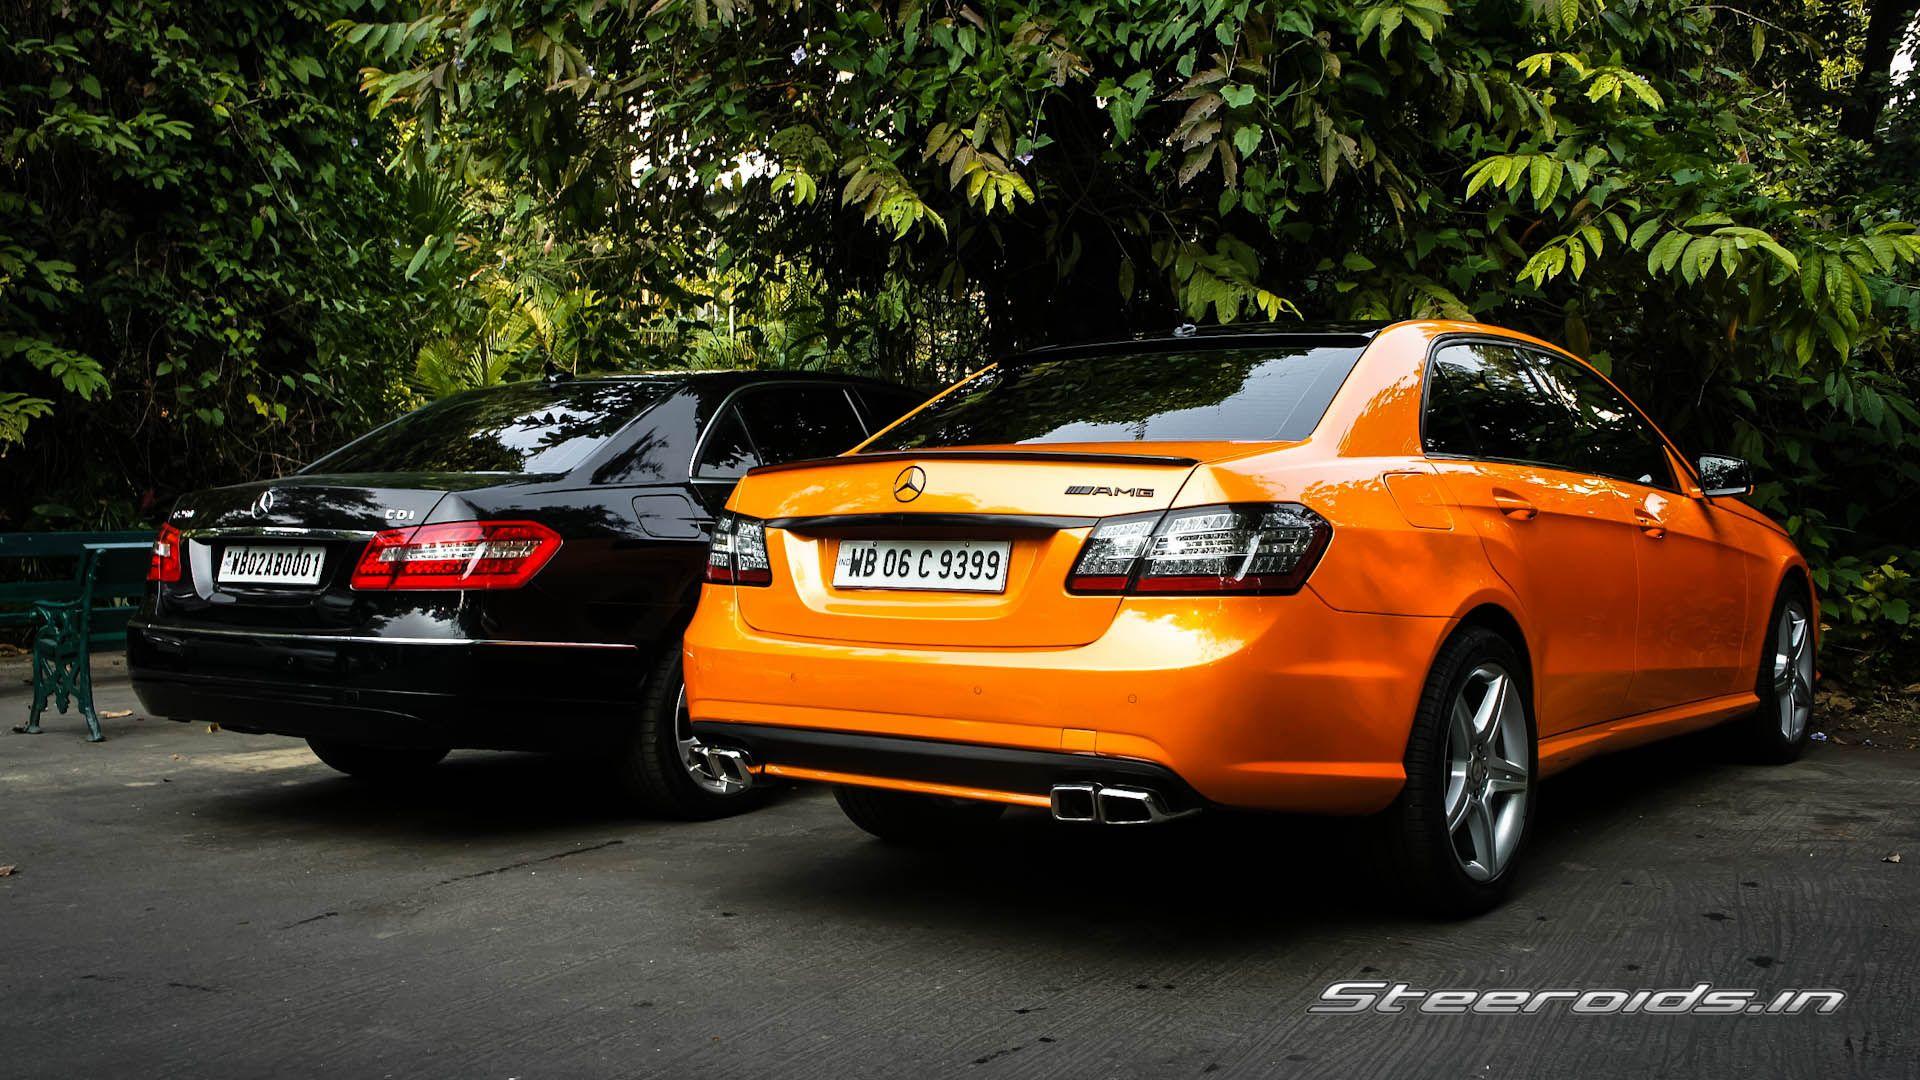 Black vs Orange Eclass Car sharing, Modified cars, Bmw car